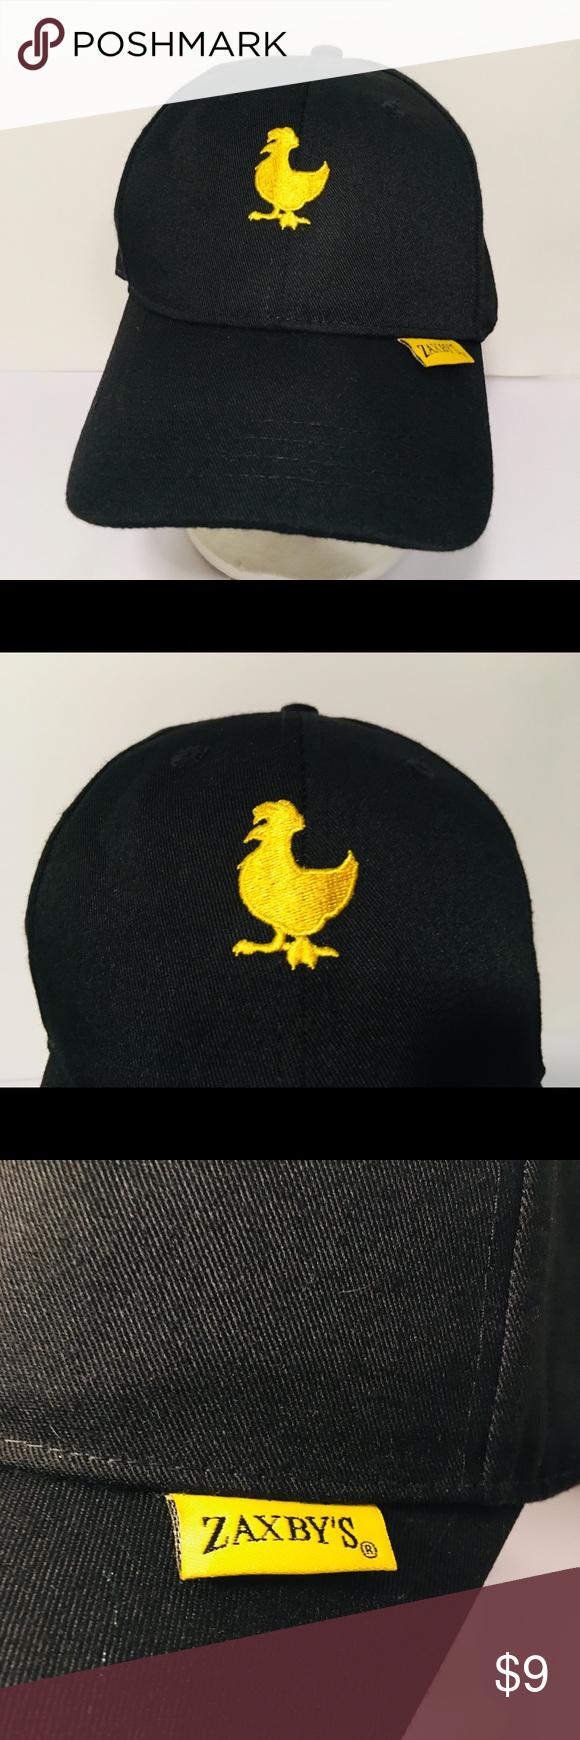 Zaxby's Hat, Employee, Black, Adjustable B • Get your